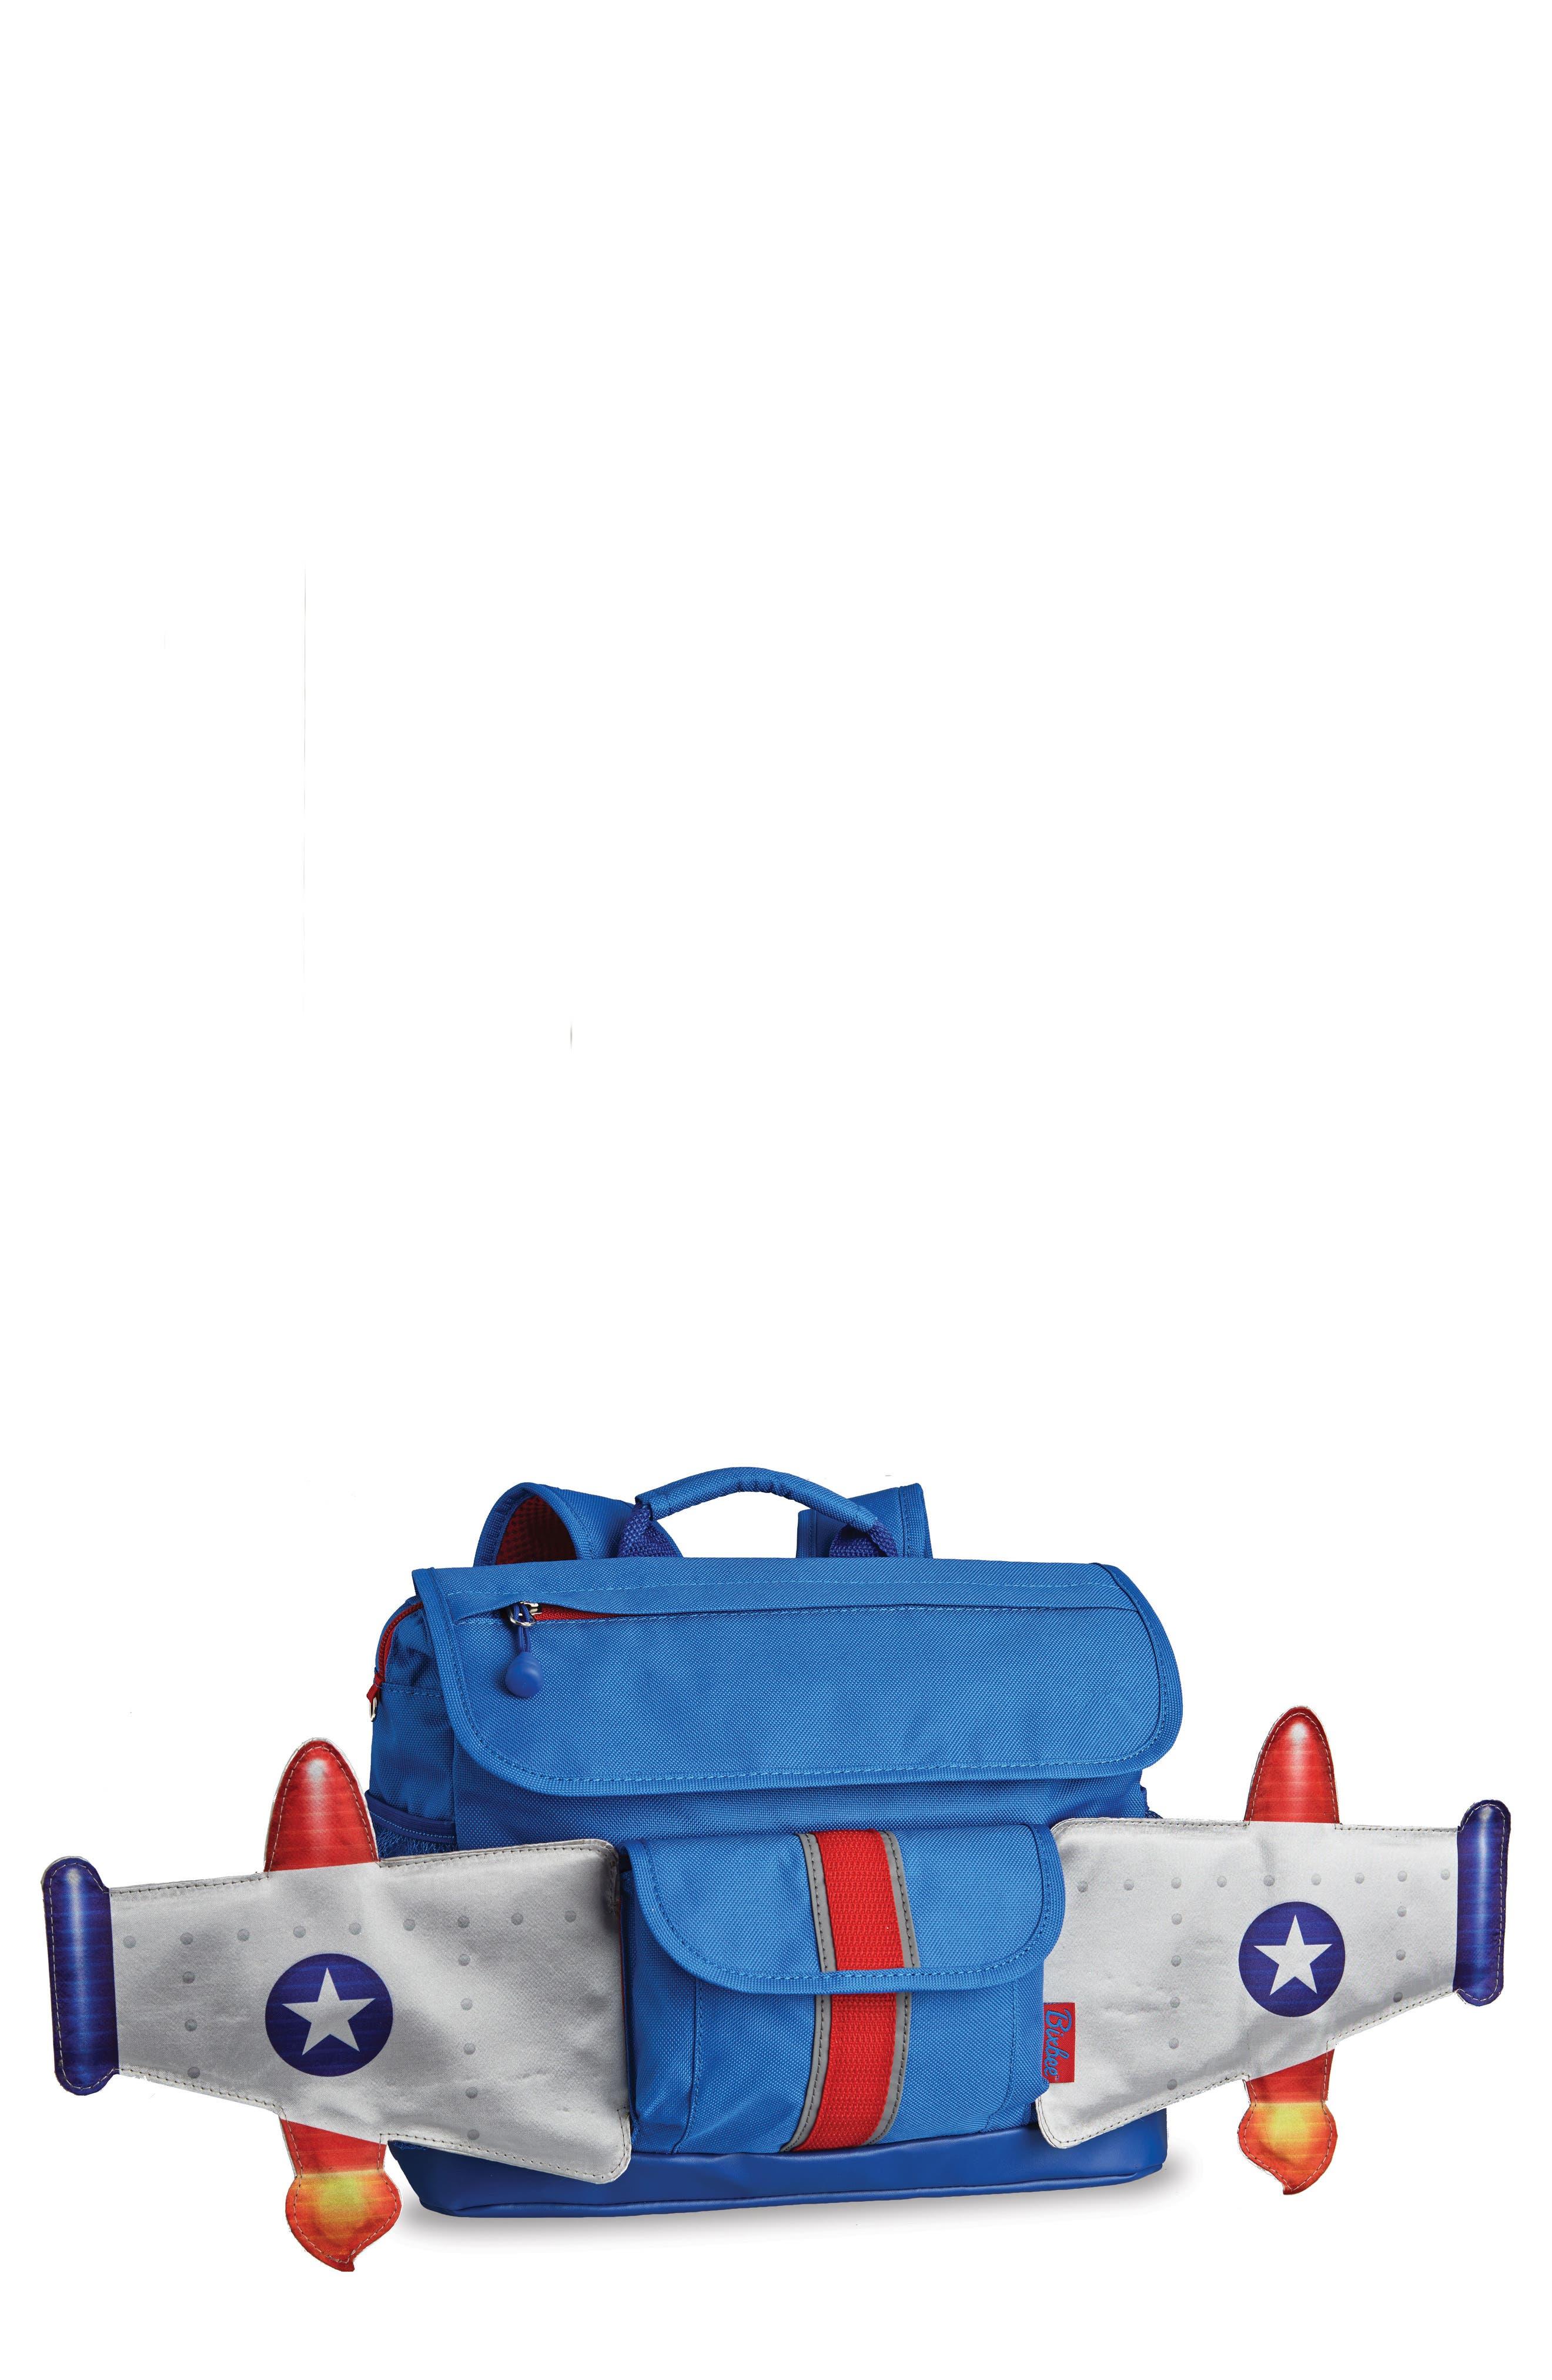 Rocketflyer Water-Resistant Backpack,                         Main,                         color, 400